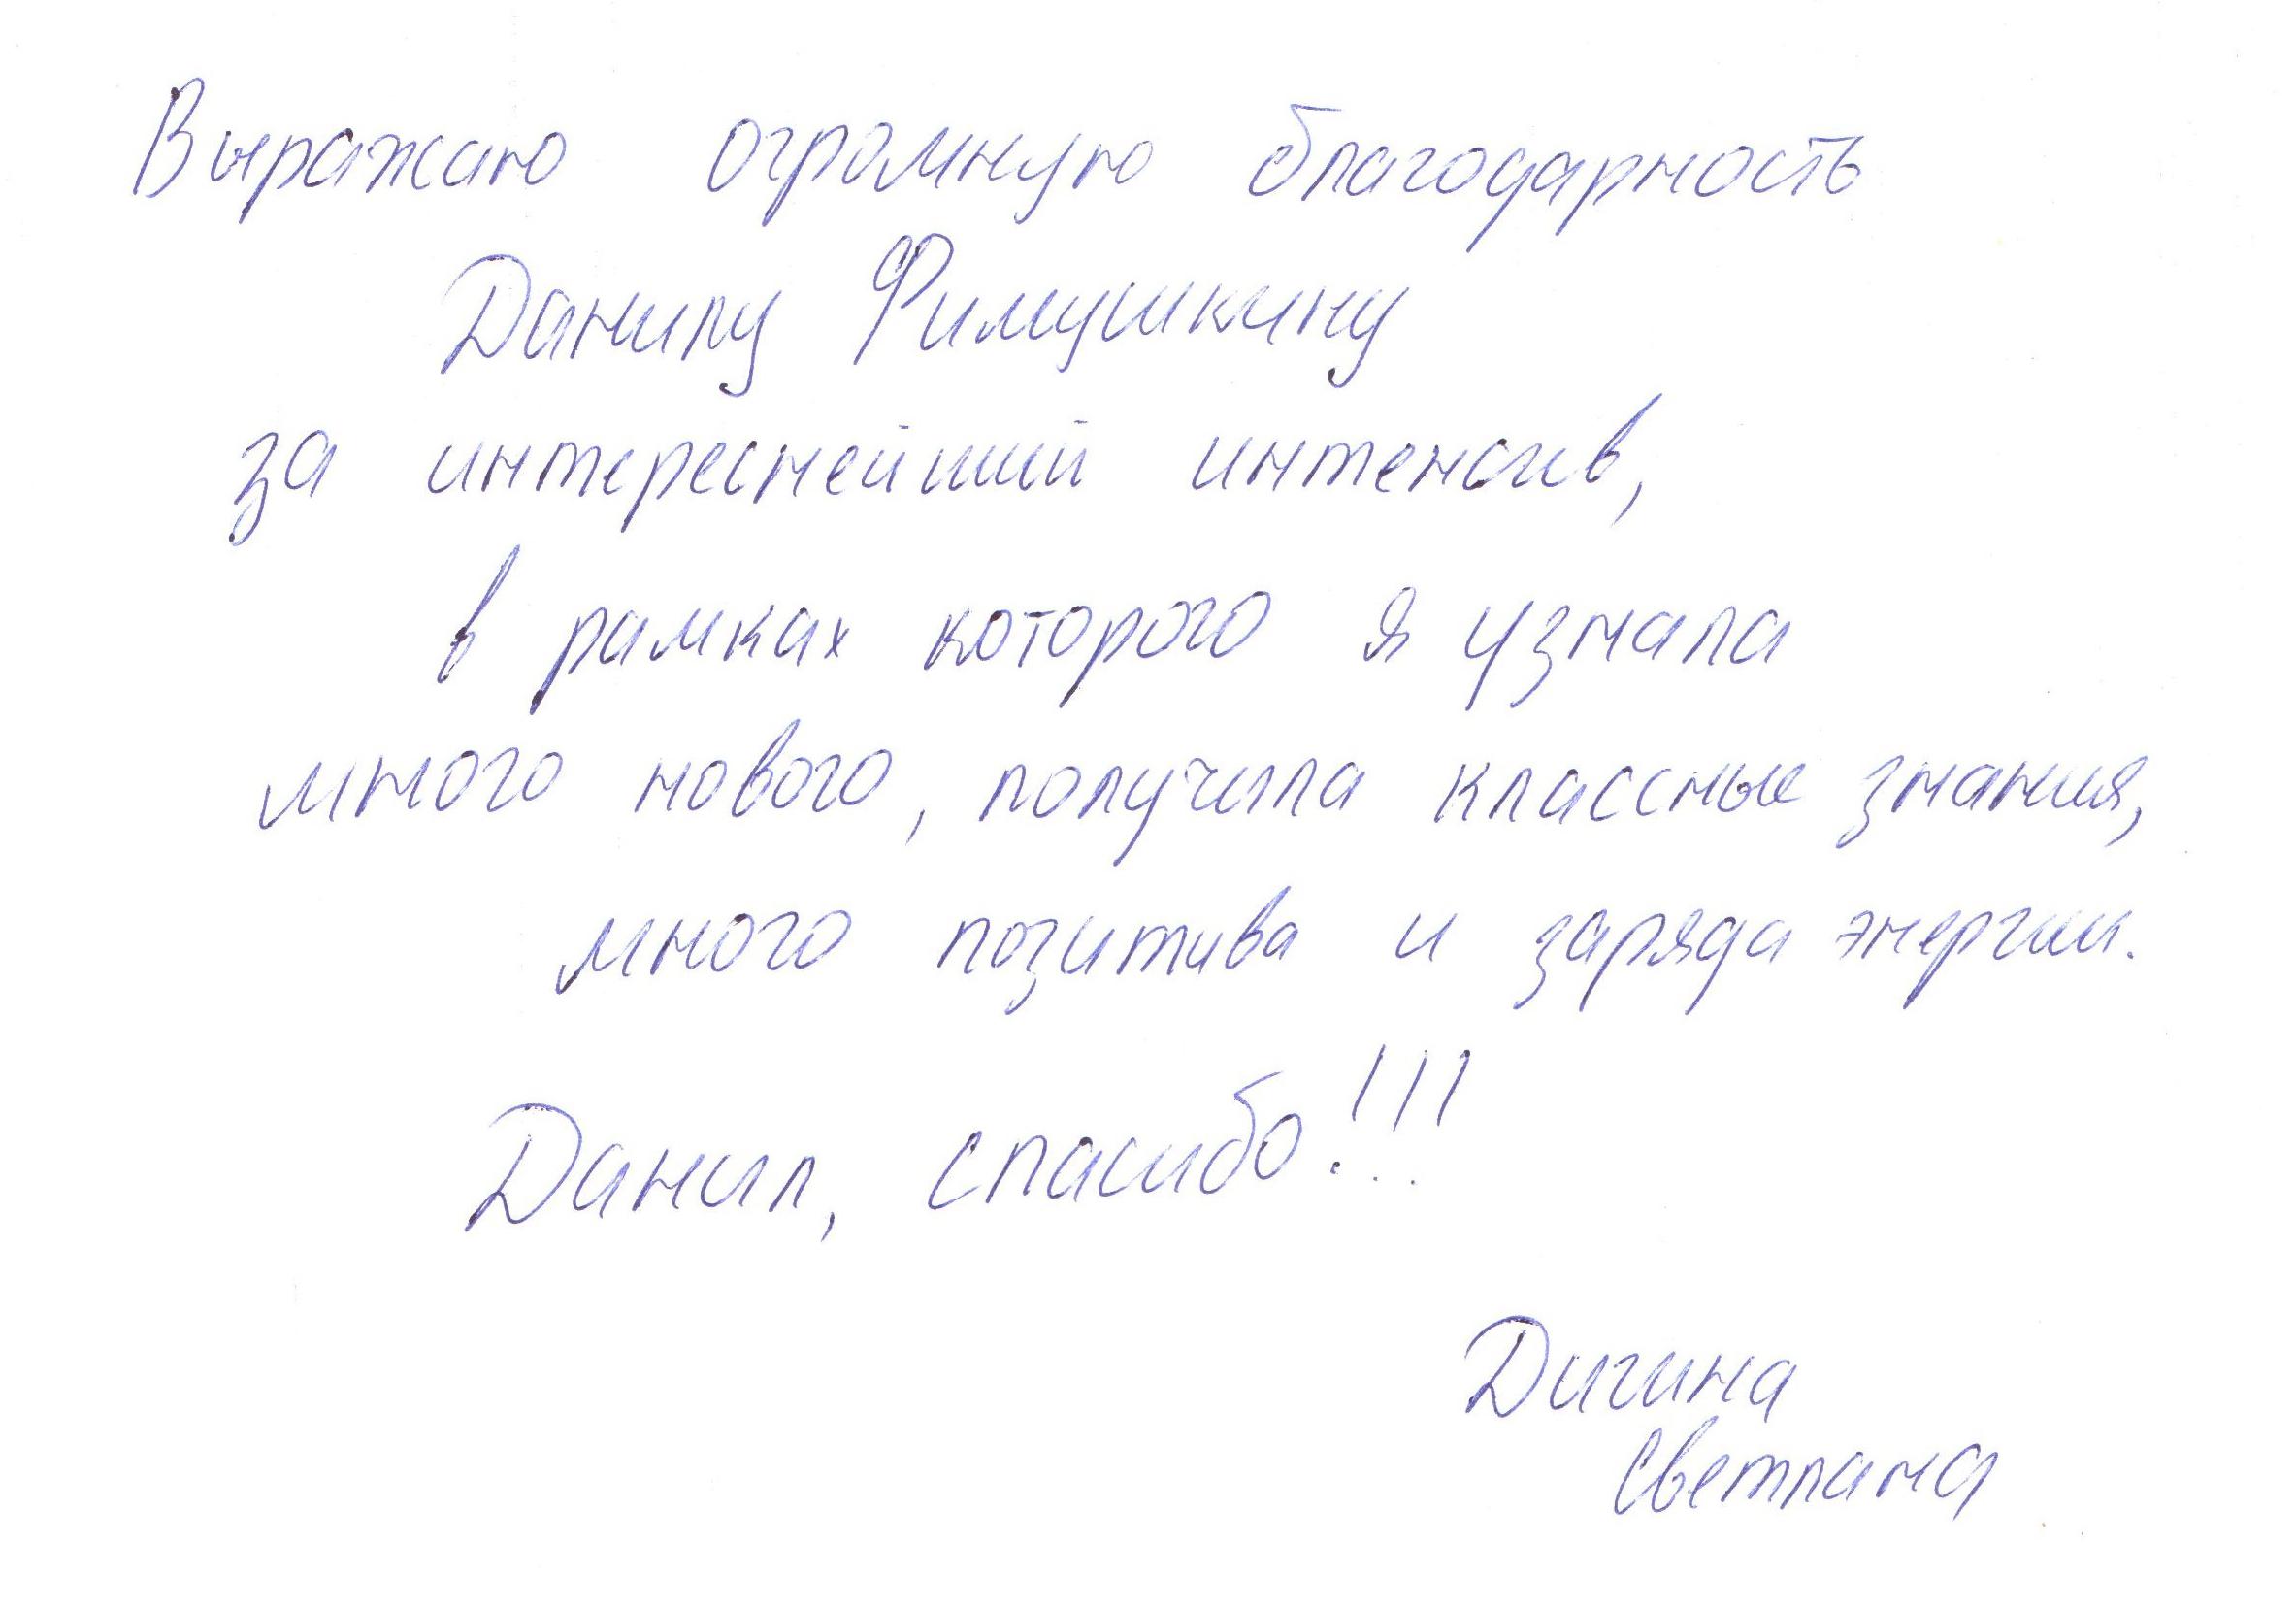 отзыв об интенсиве Данила Фимушкина в Самаре Дигиной Светланы